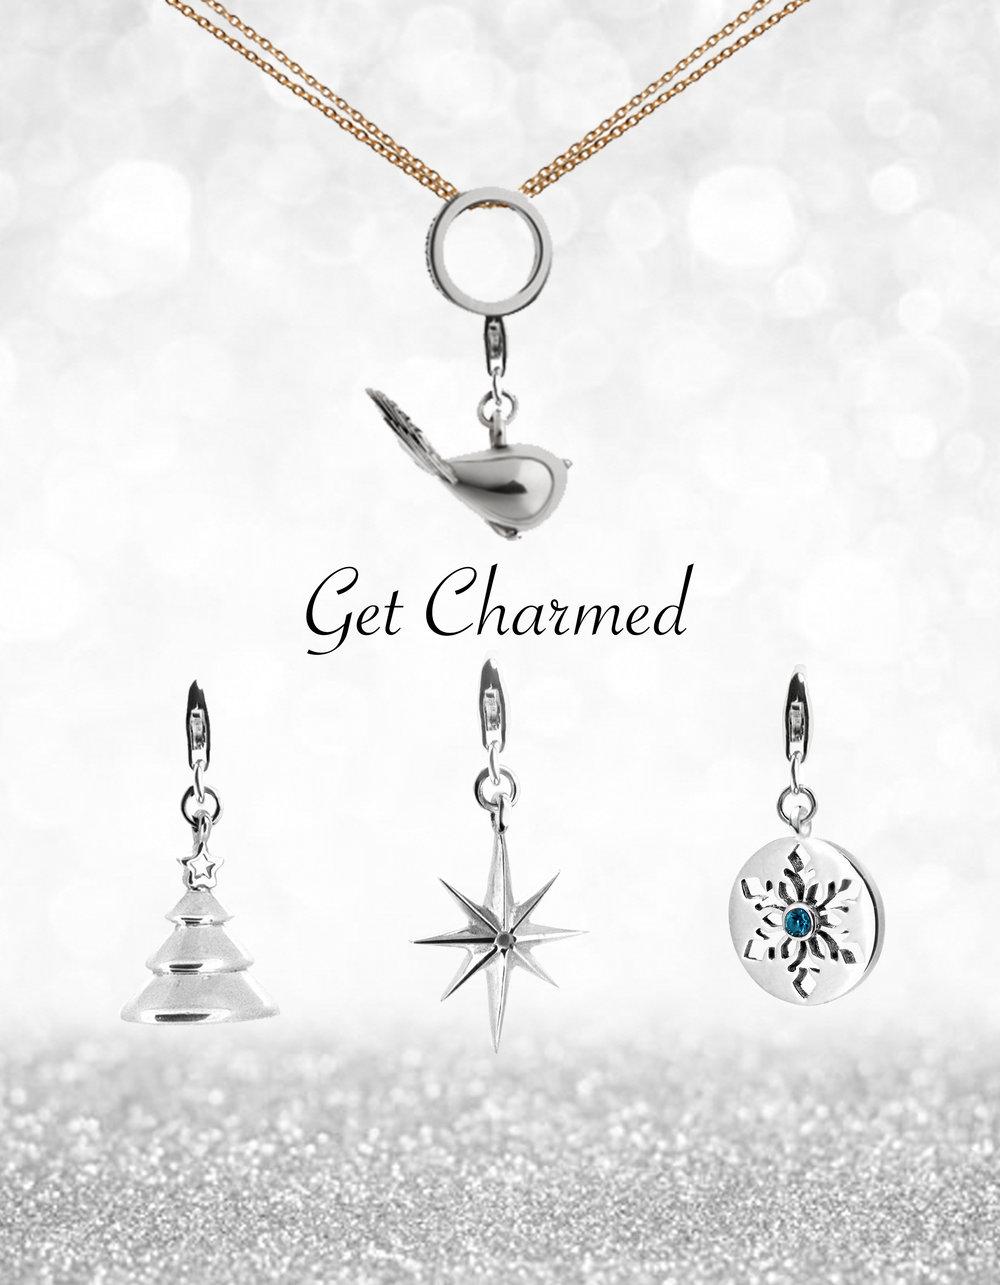 XMAS Get Charmed.jpg